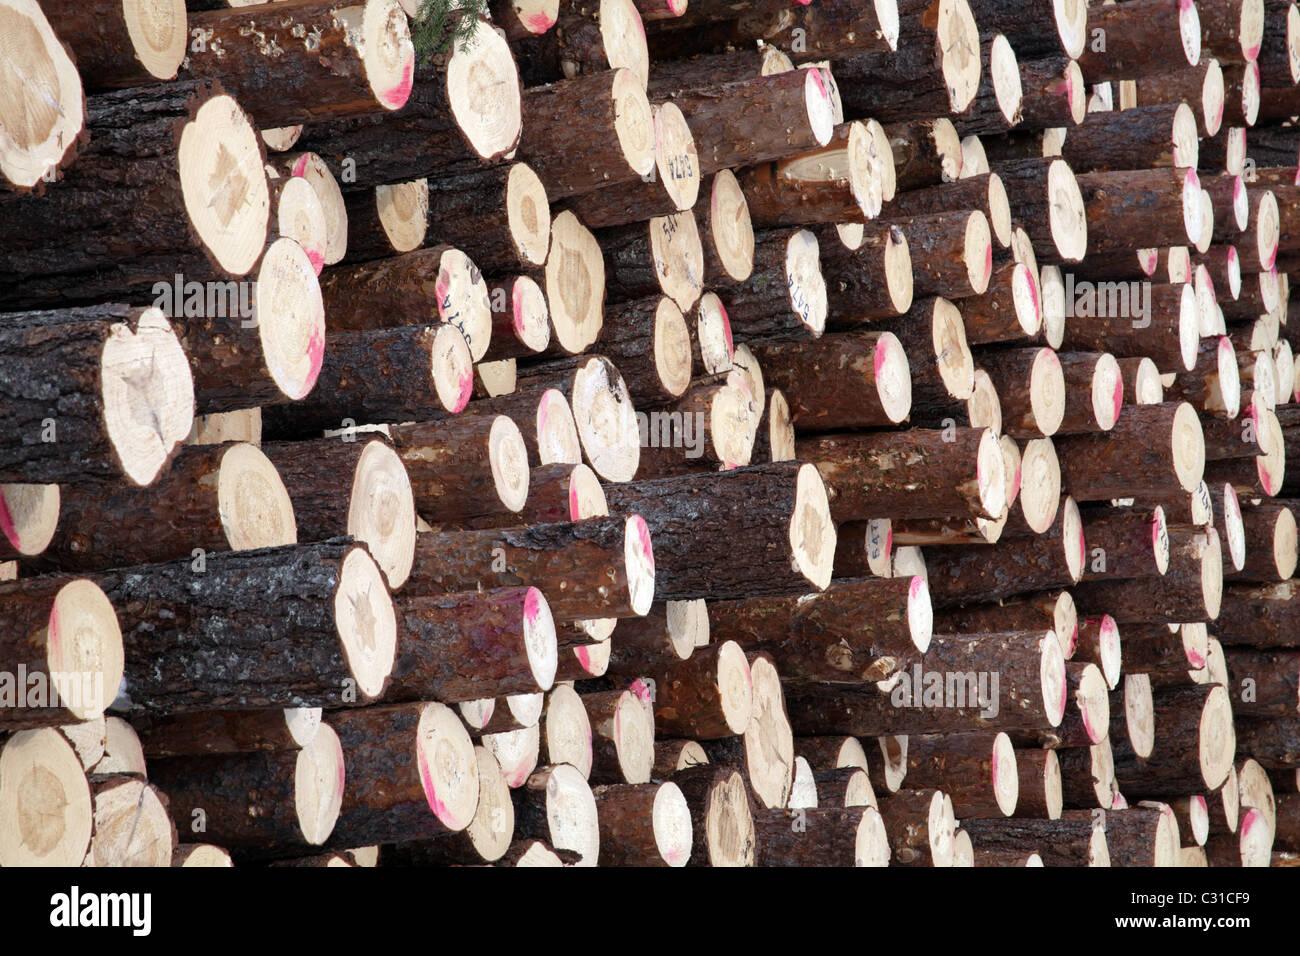 Large stack of pine tree trunks ready for transportation, Arvidsjaur, Northern Sweden - Stock Image